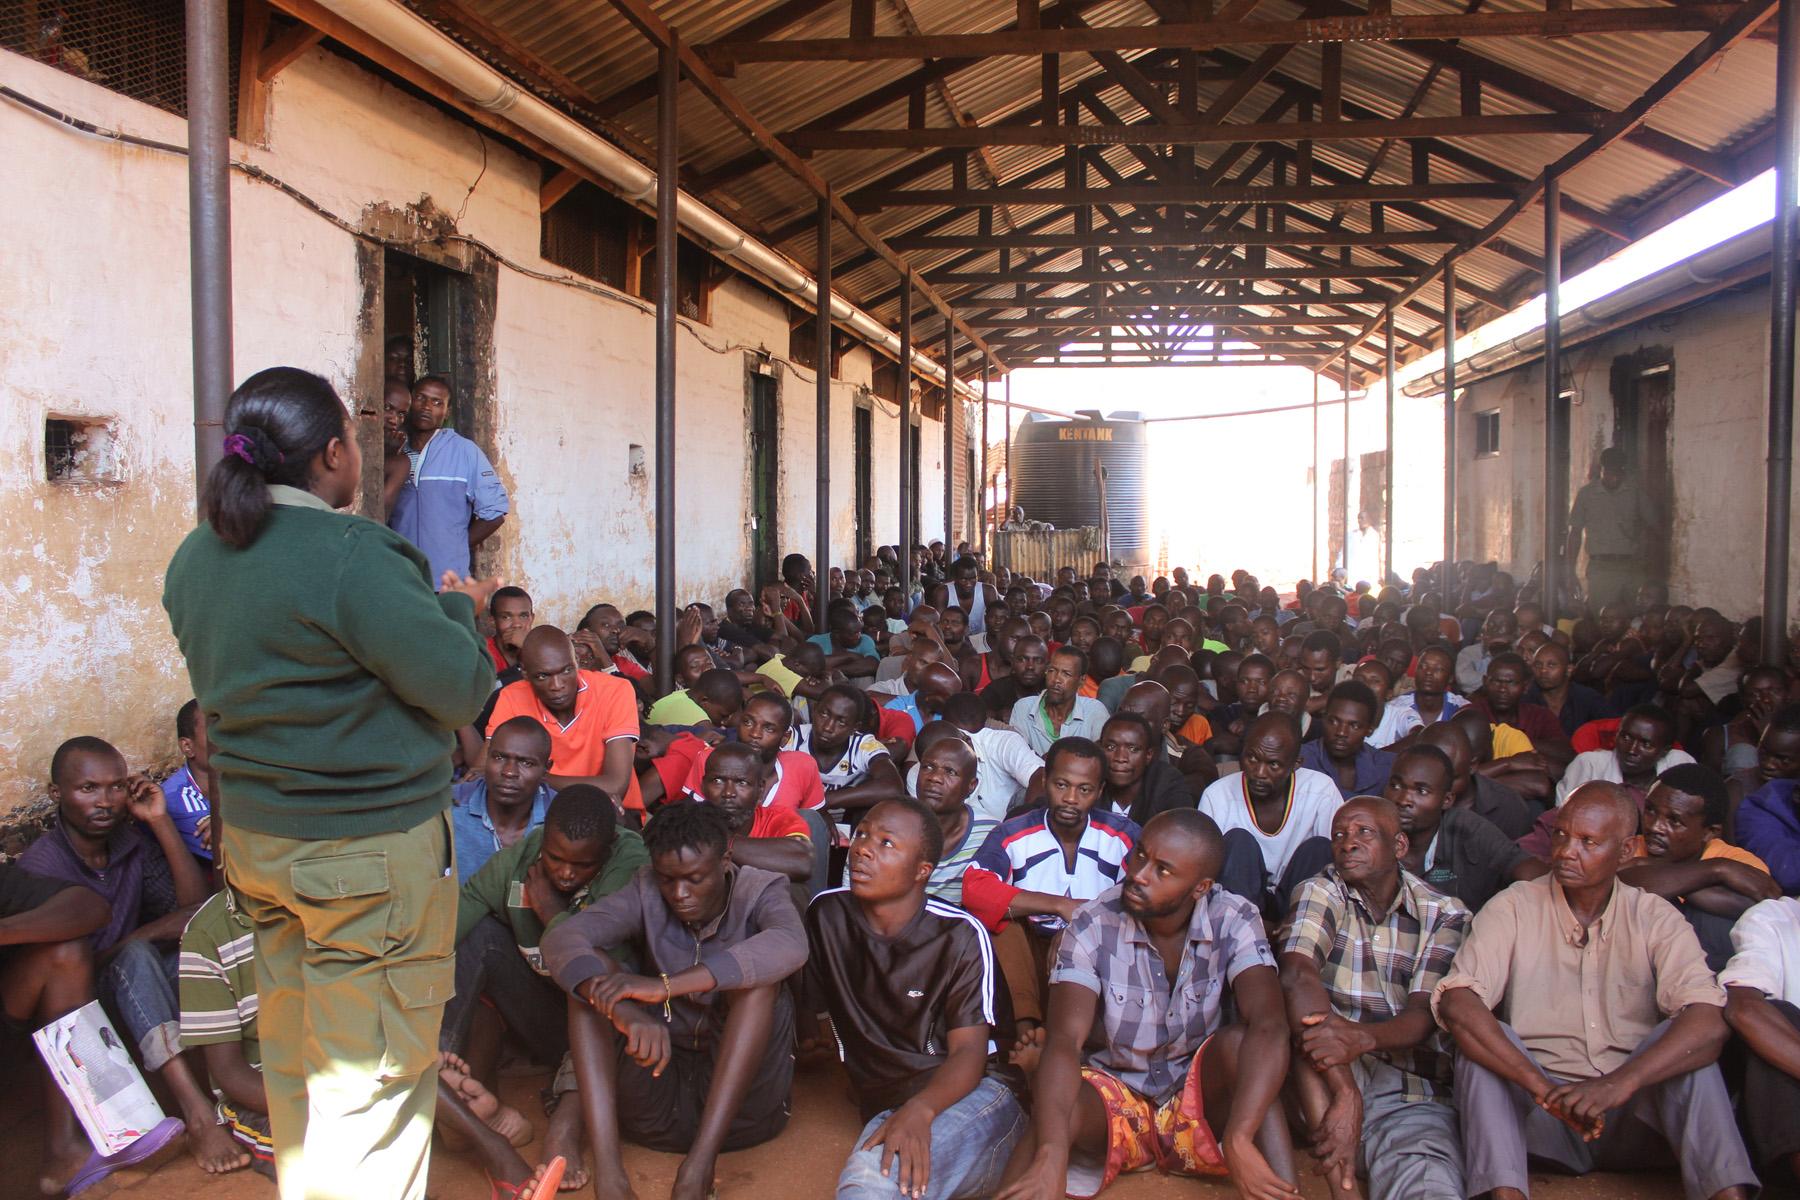 Legal aid session for remands at Luzira Prison, Uganda.